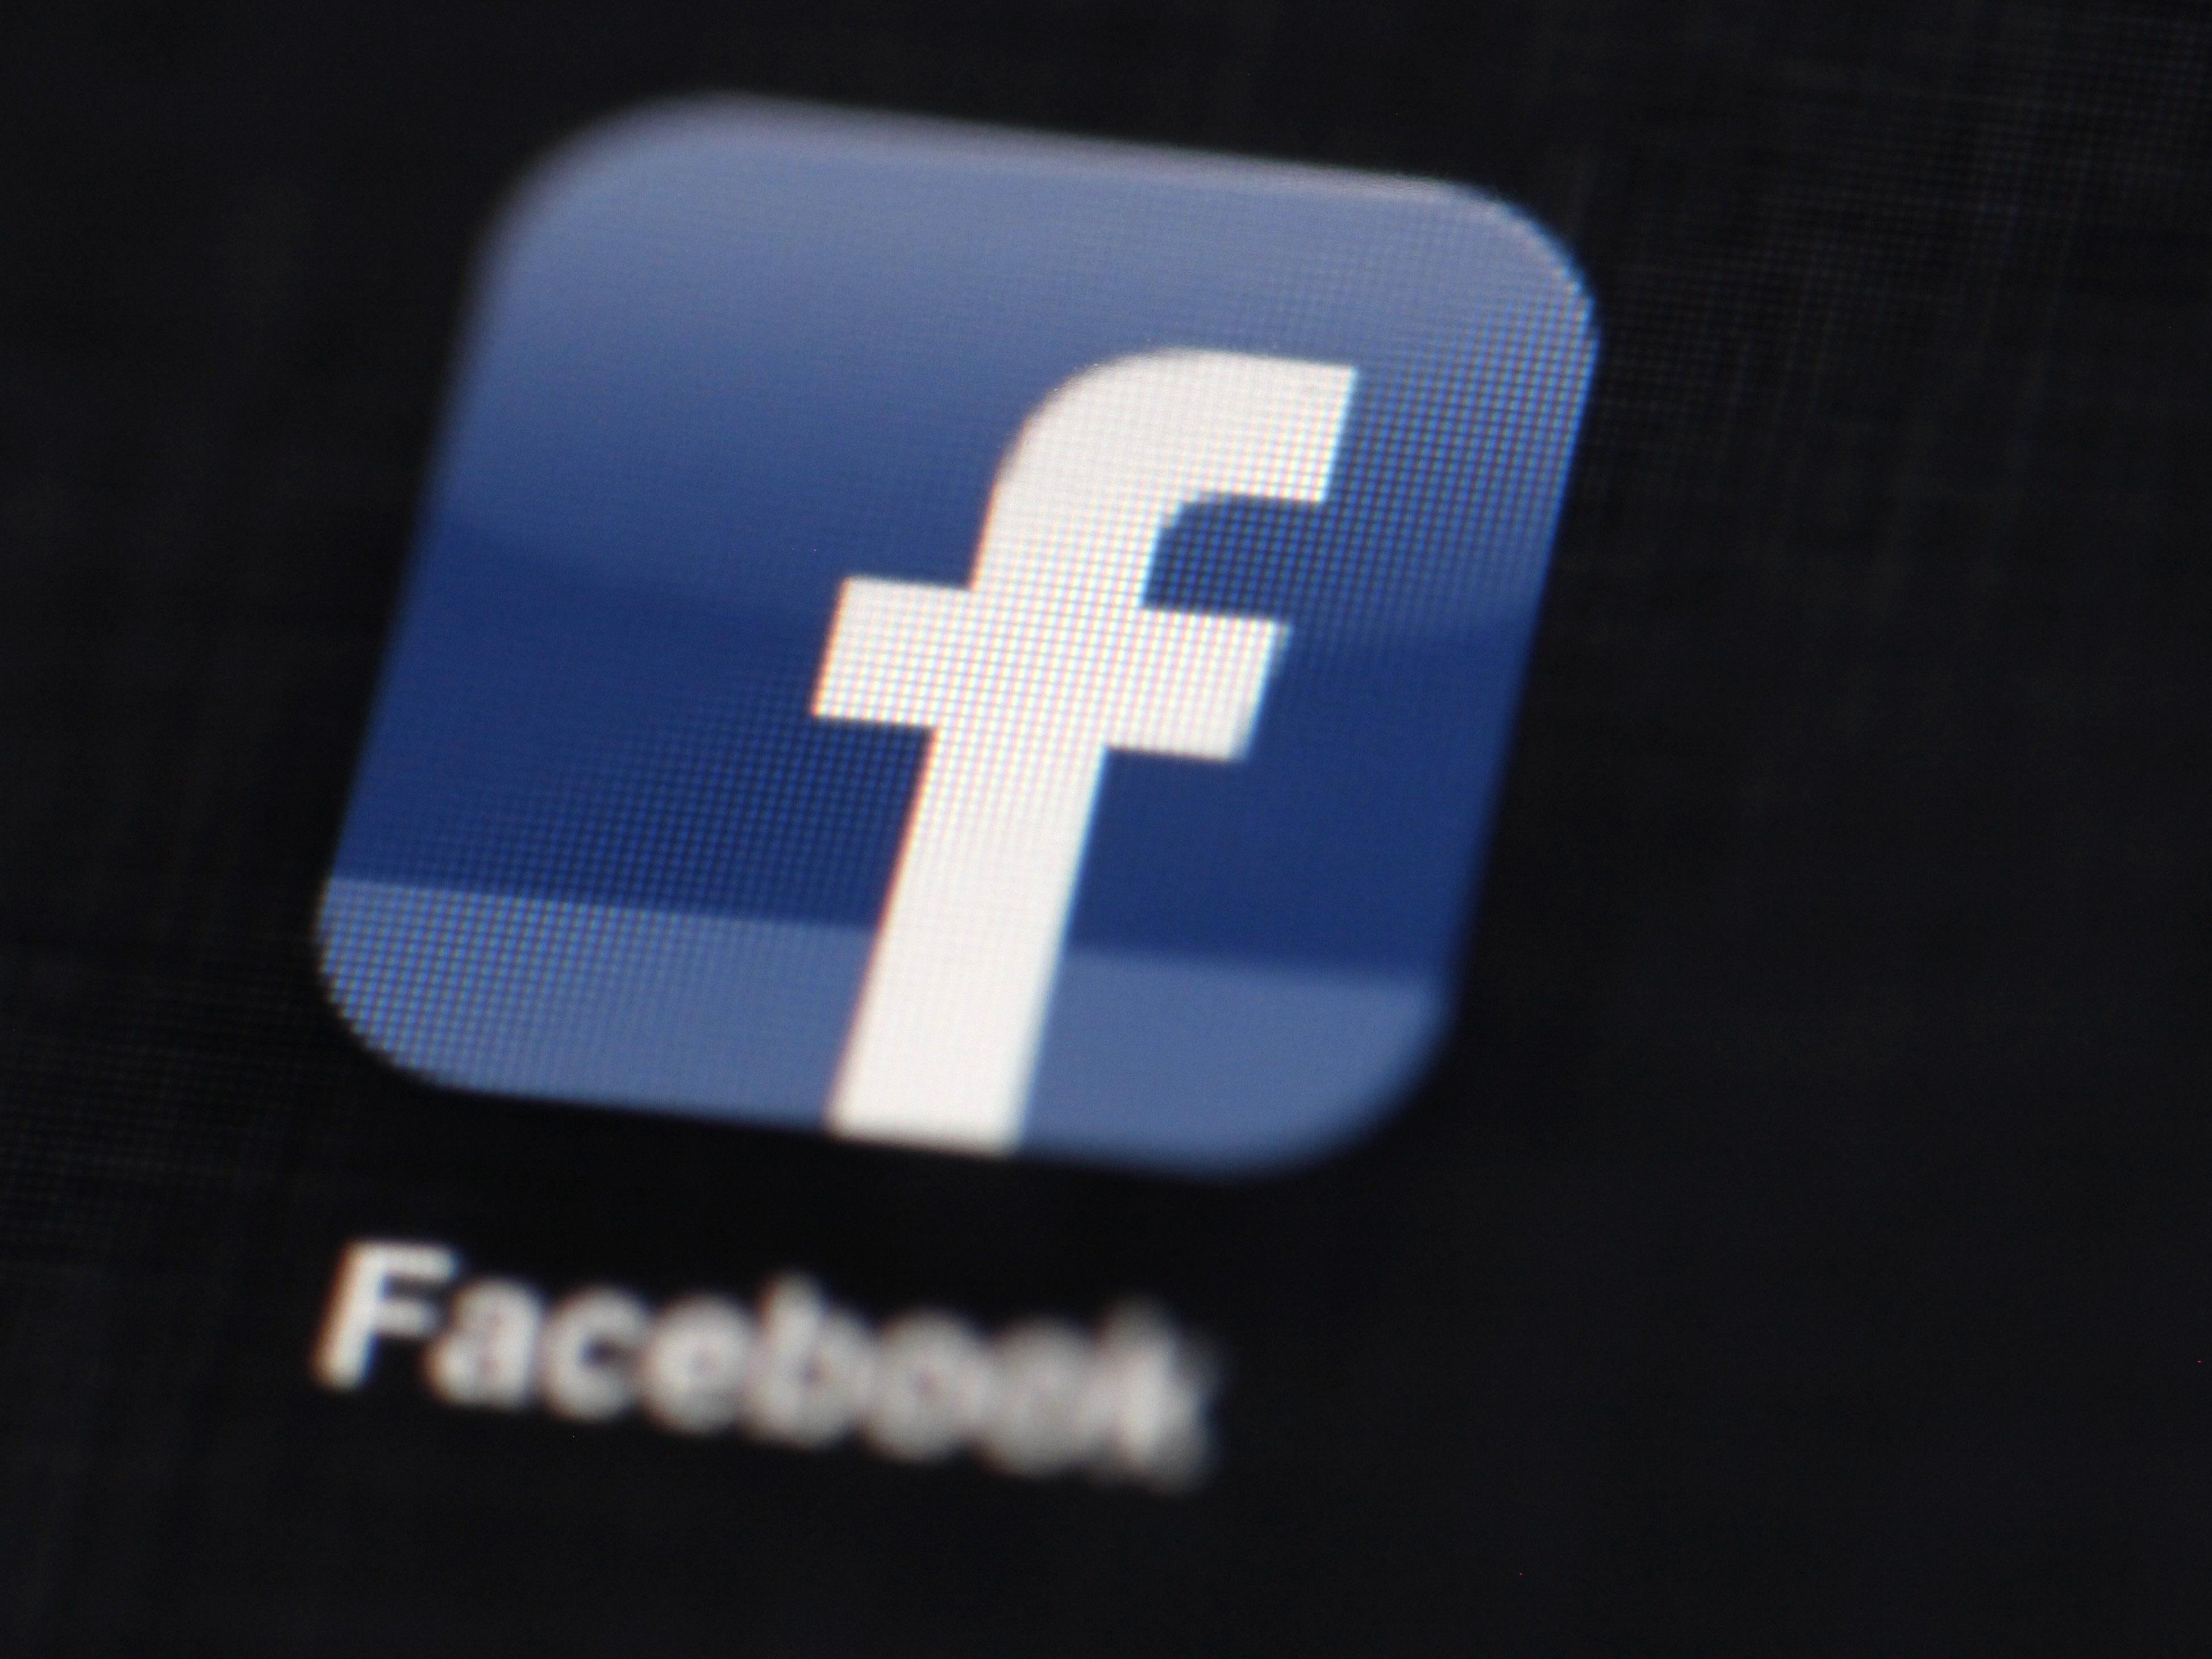 Volkshilfe übt heftige Kritik an Facebook.